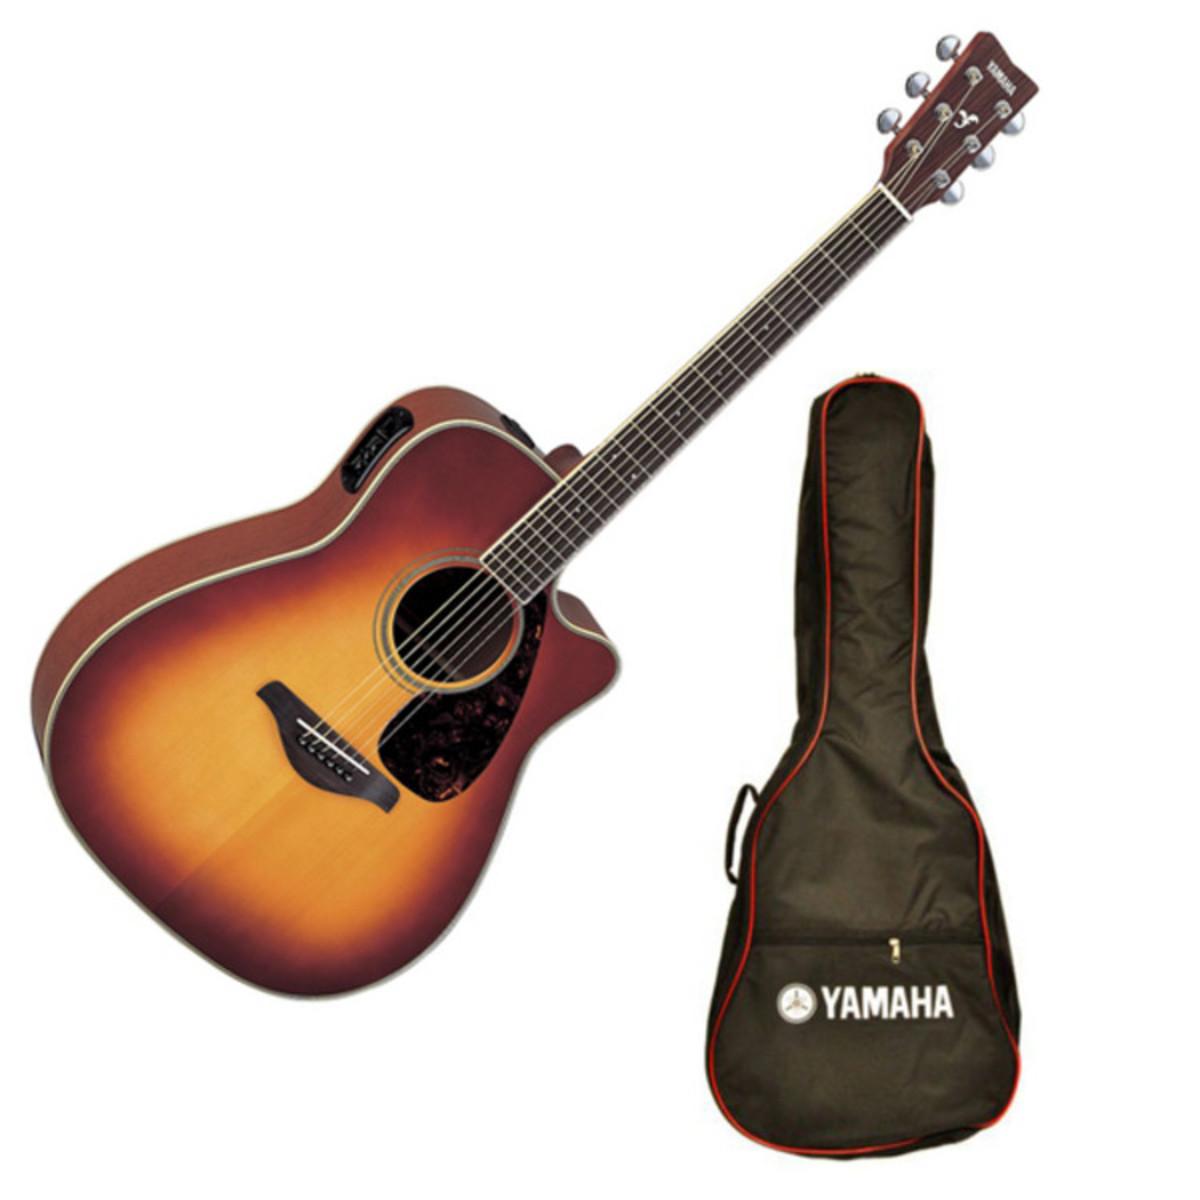 yamaha fgx720sca electro acoustic guitar sunburst with. Black Bedroom Furniture Sets. Home Design Ideas